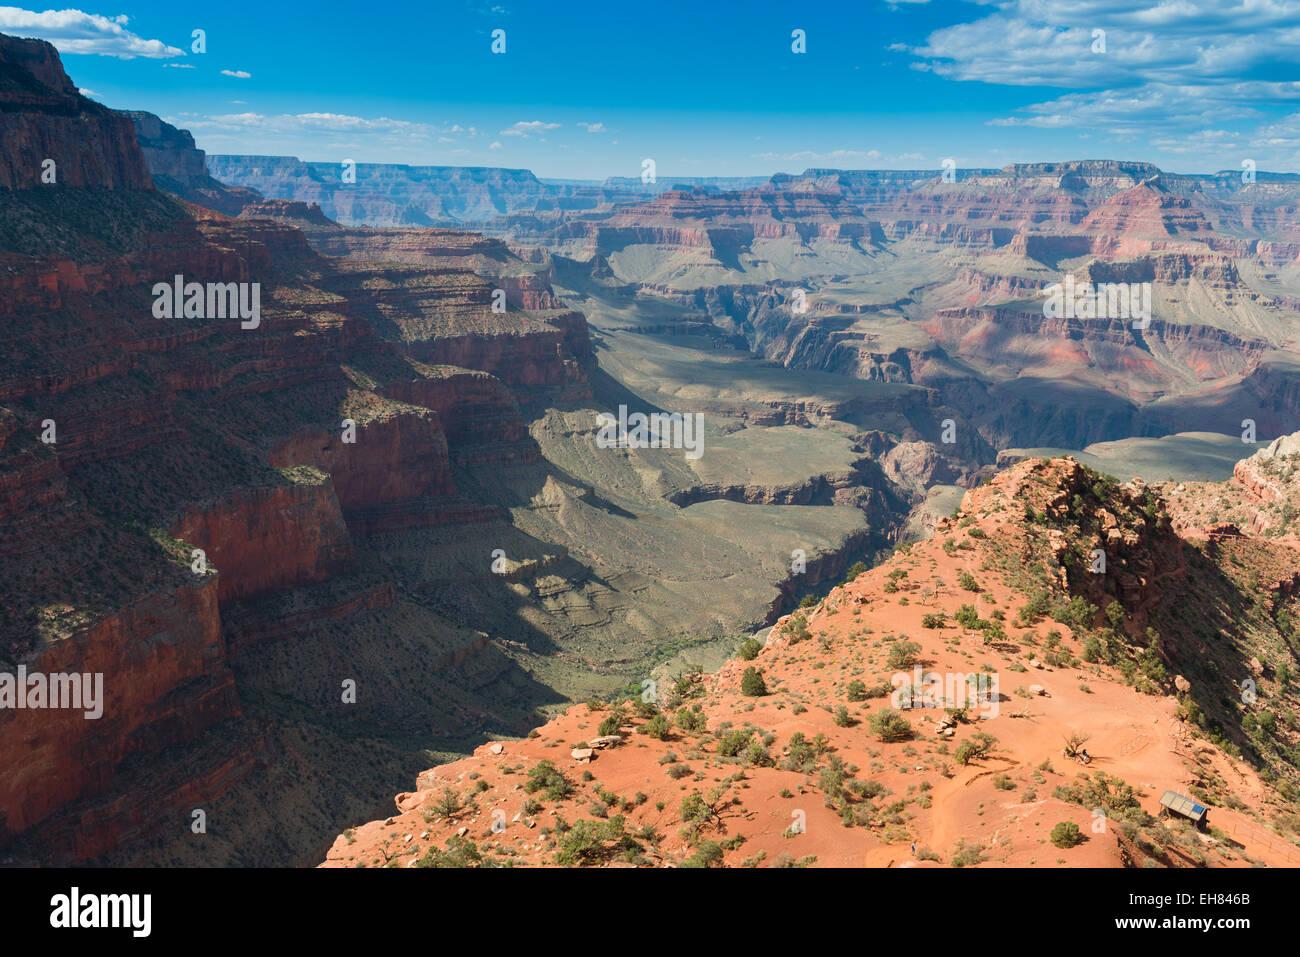 Grand Canyon National Park, Arizona, USA - Stock Image